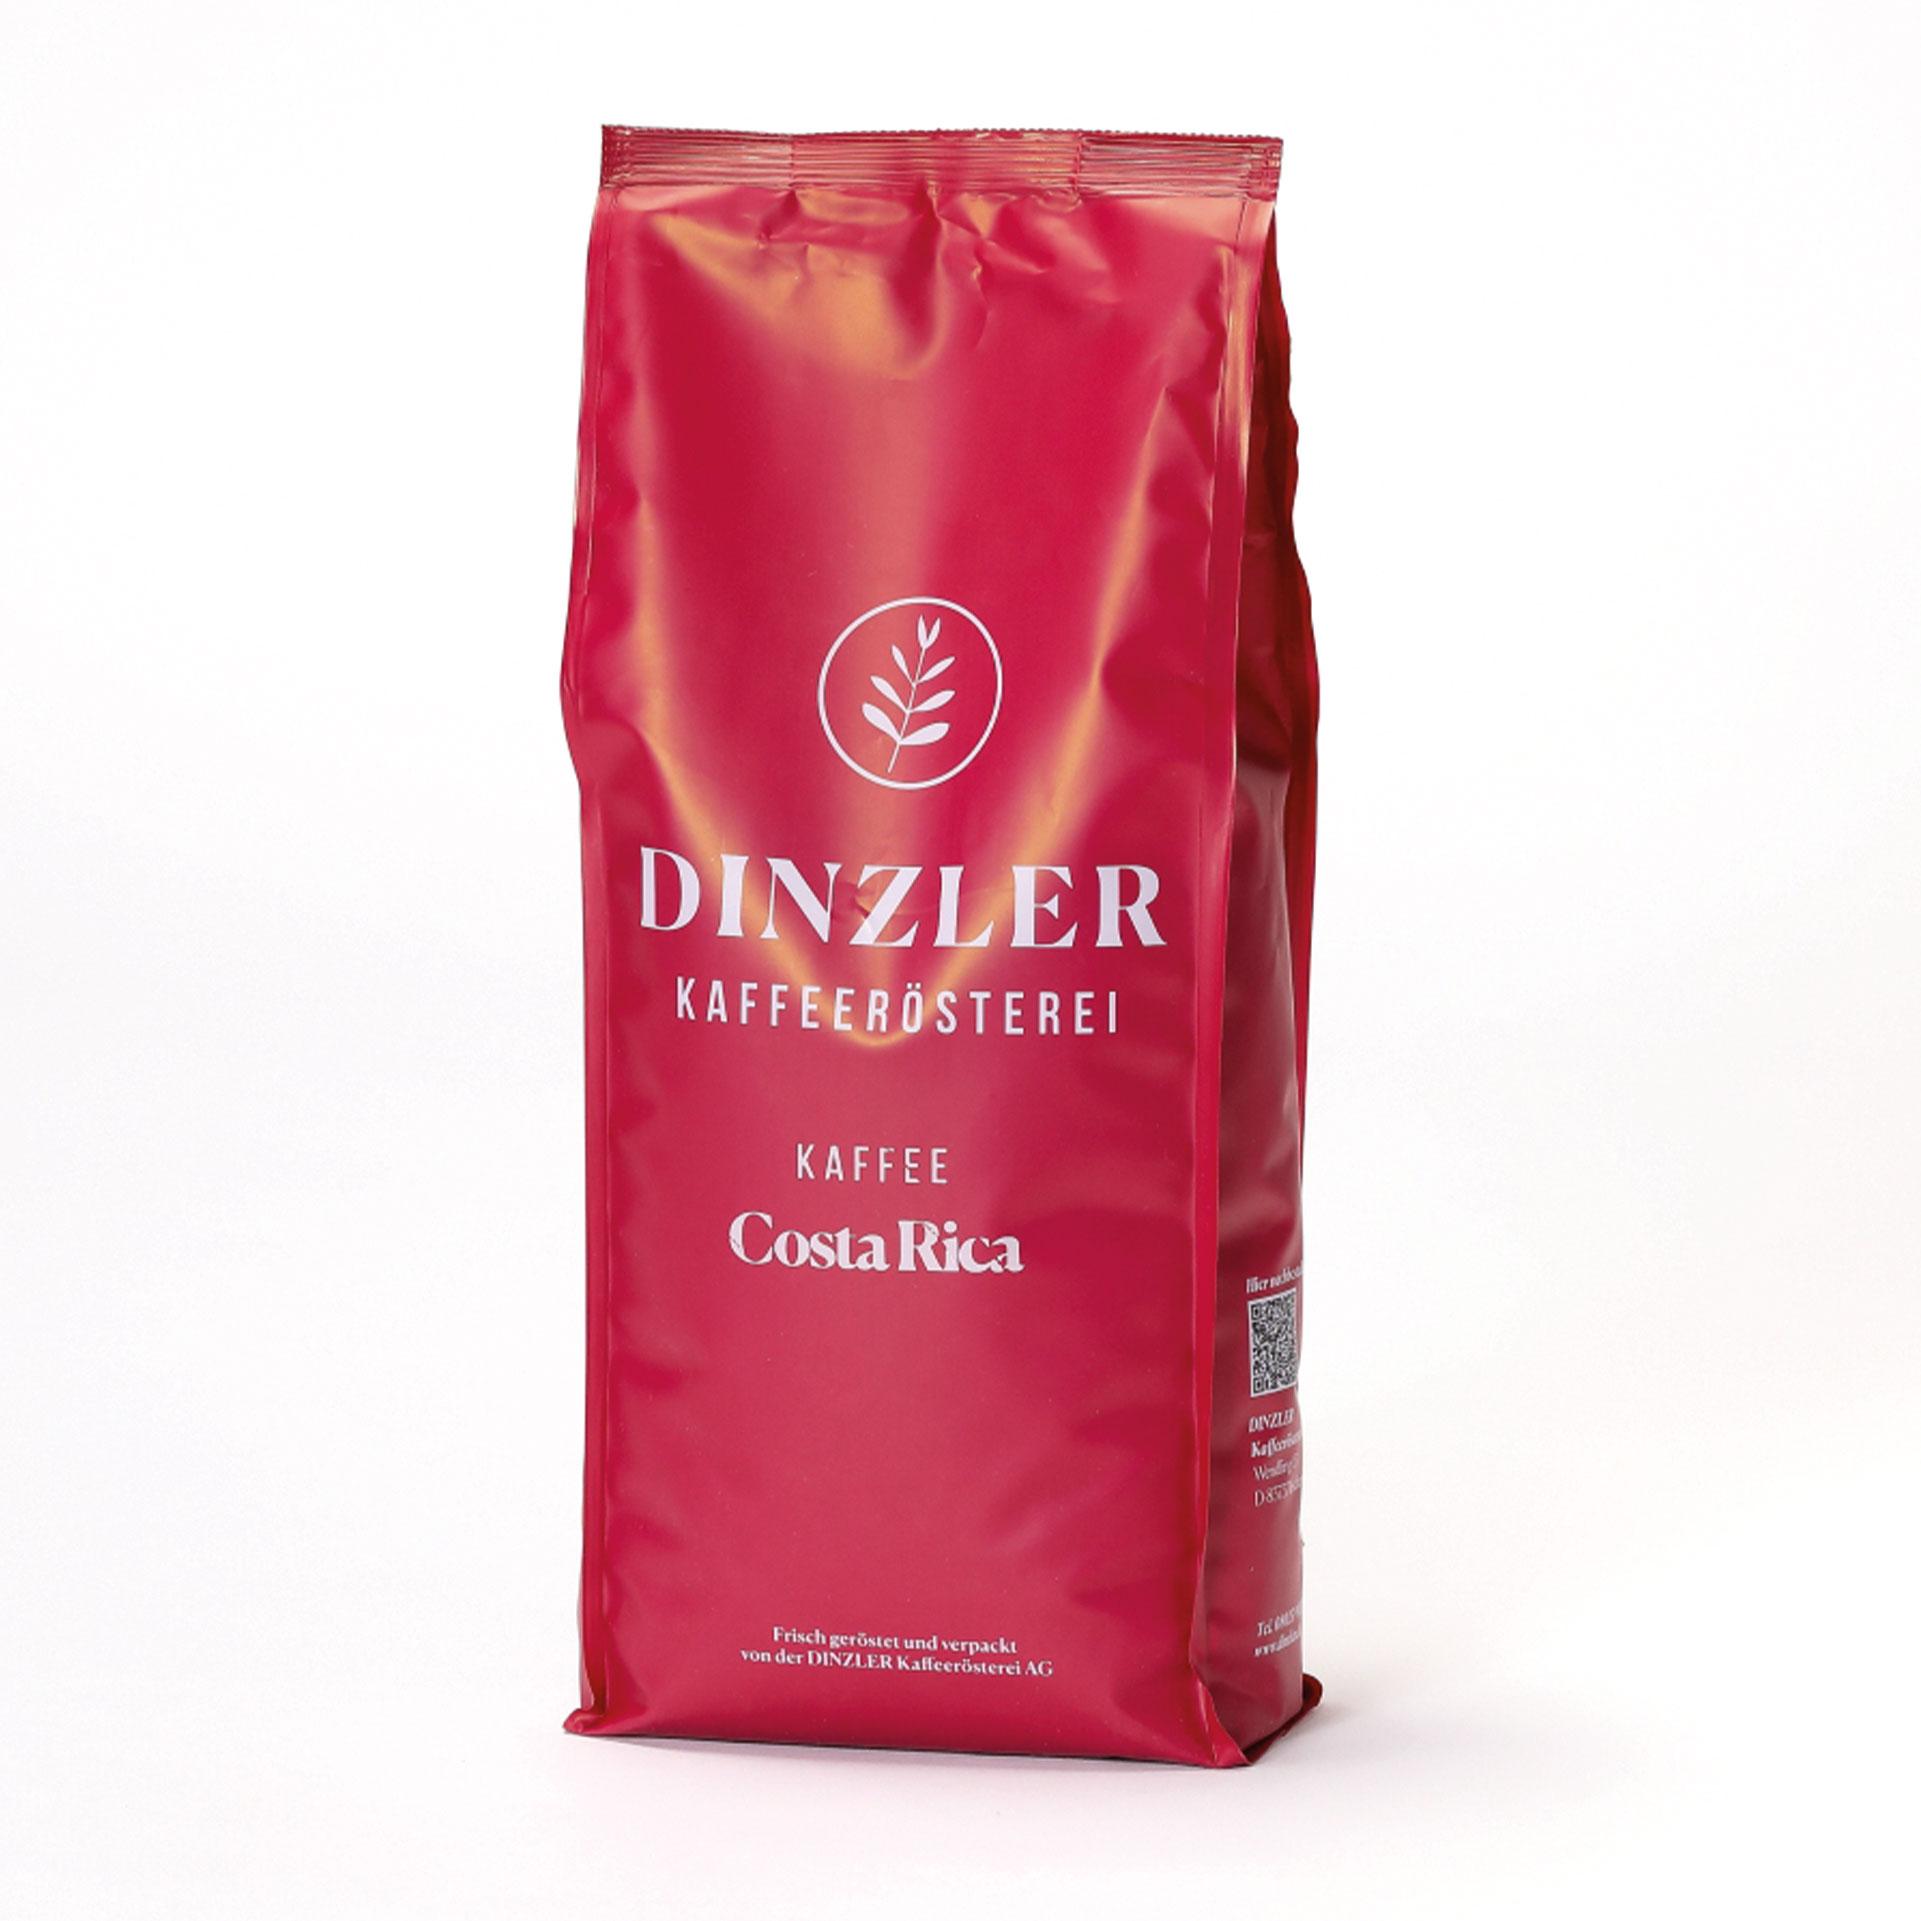 DINZLER Kaffee Costa Rica